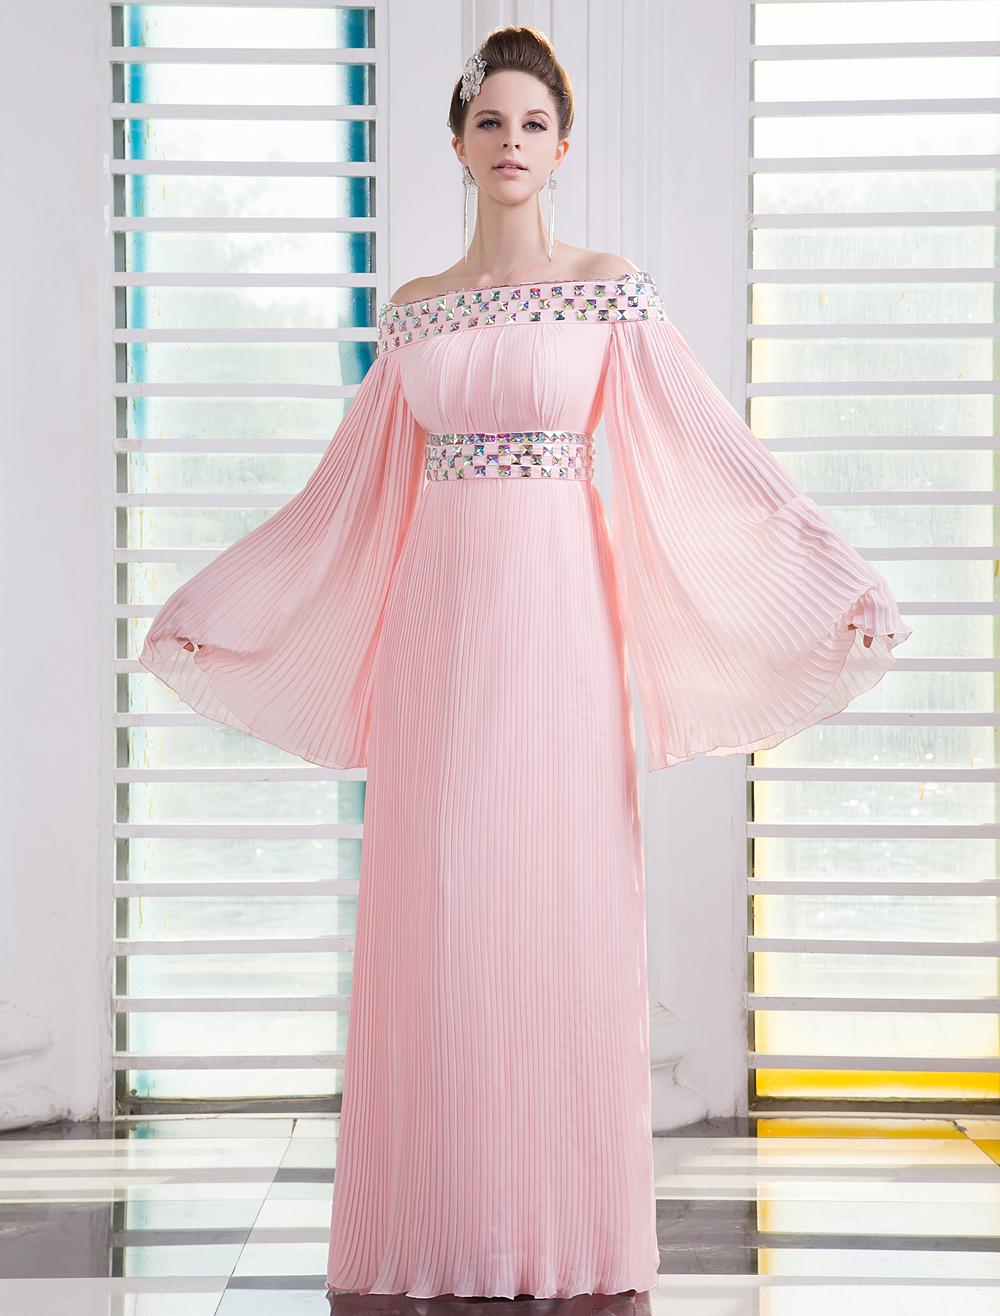 Pink Bateau Neck Long Sleeves Rhinestone A-line Chiffon Prom Dress Milanoo